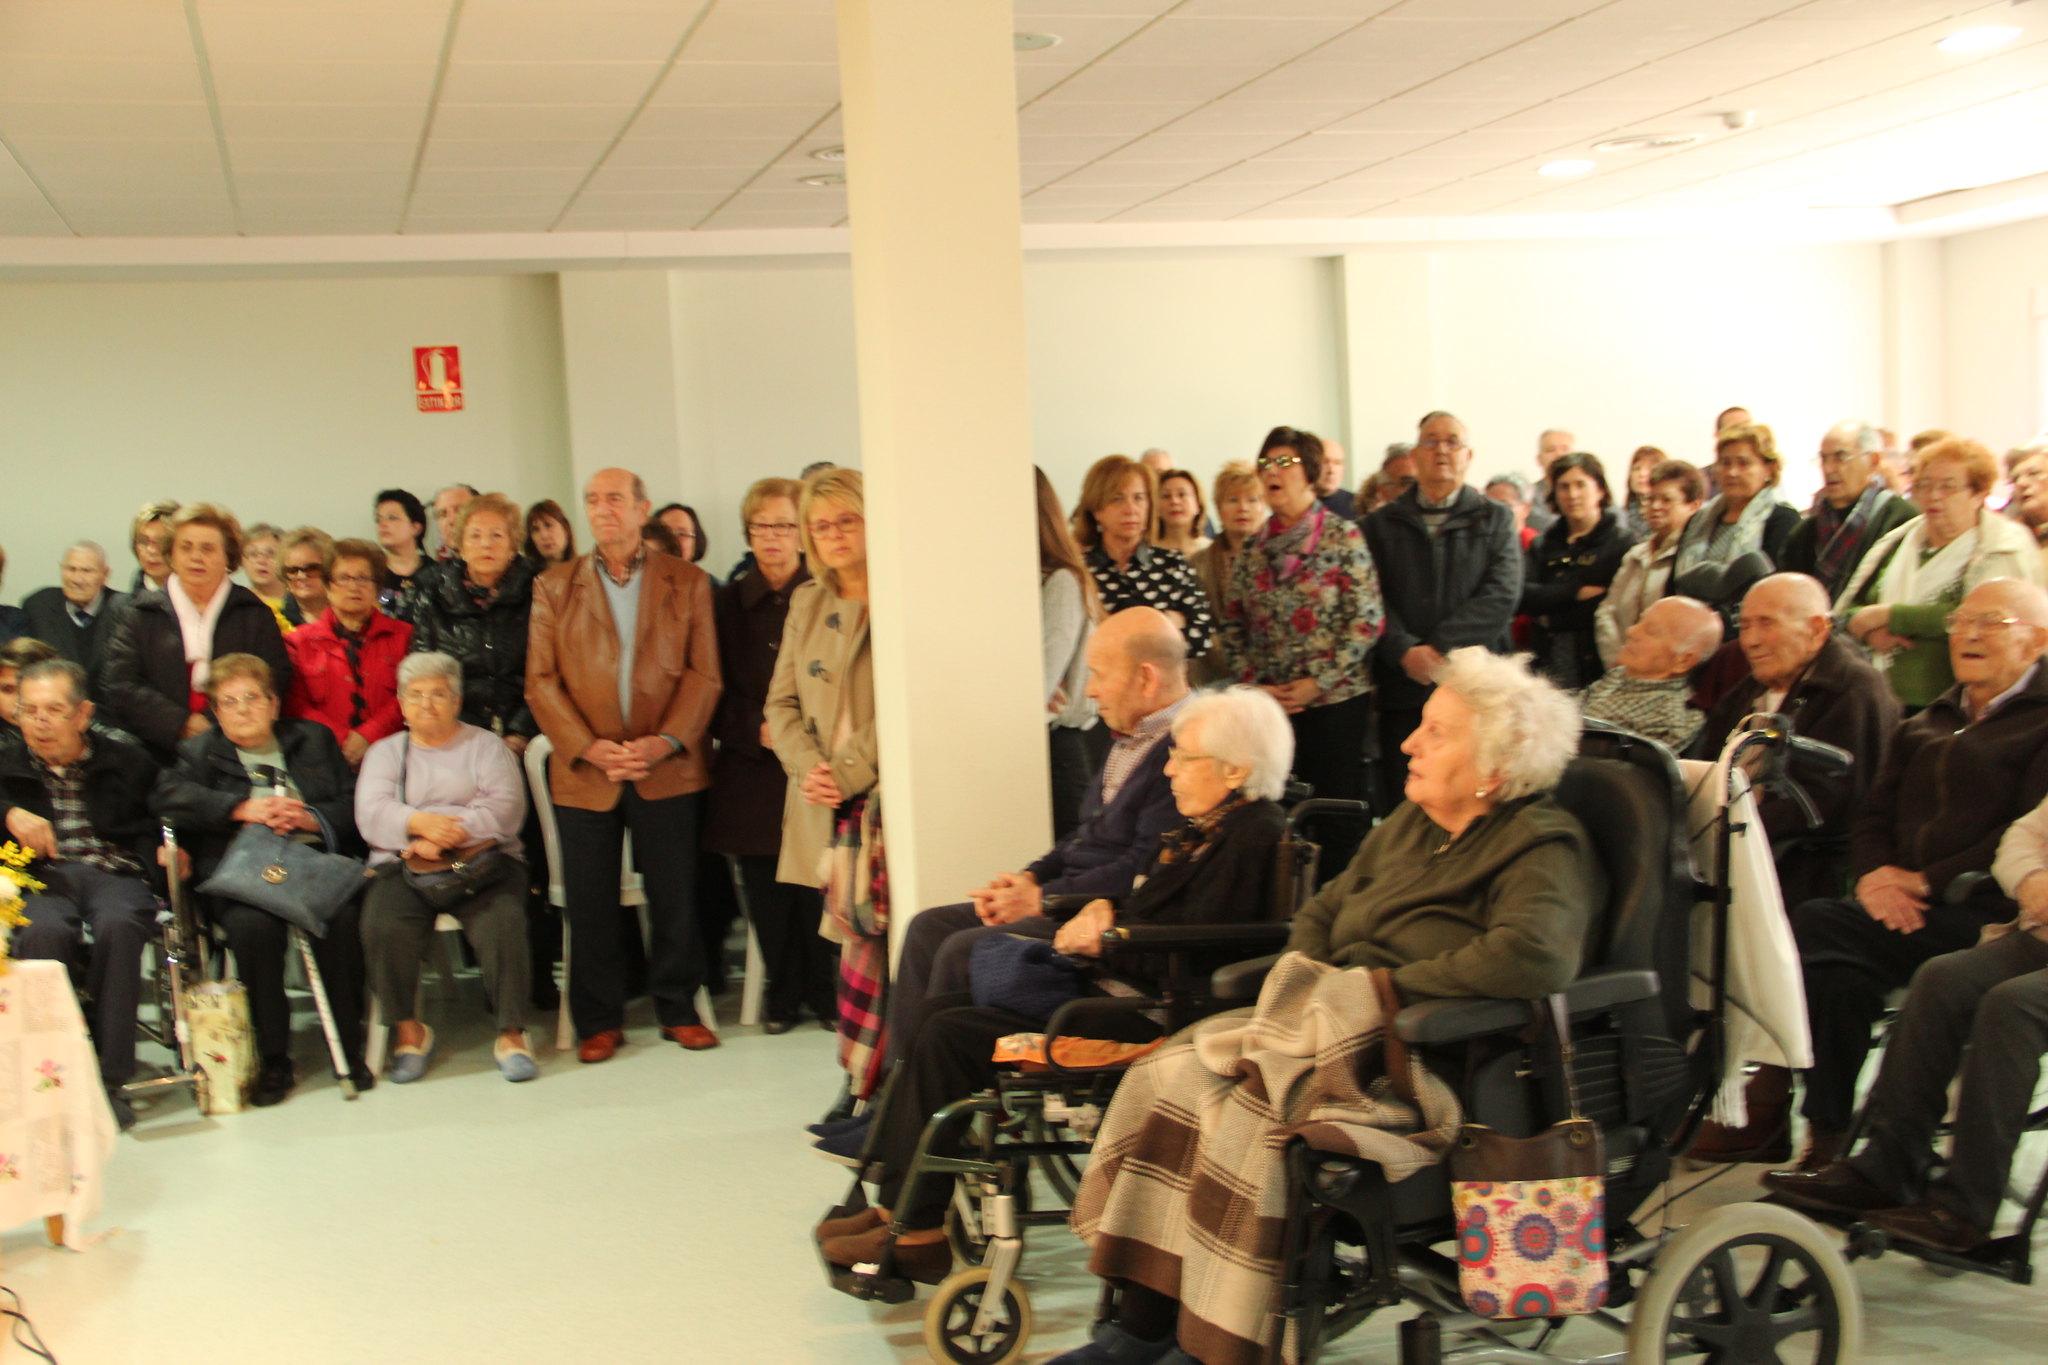 (2016-02-13) - Inauguración Virgen De Lourdes, La Molineta - Archivo La Molineta (008)